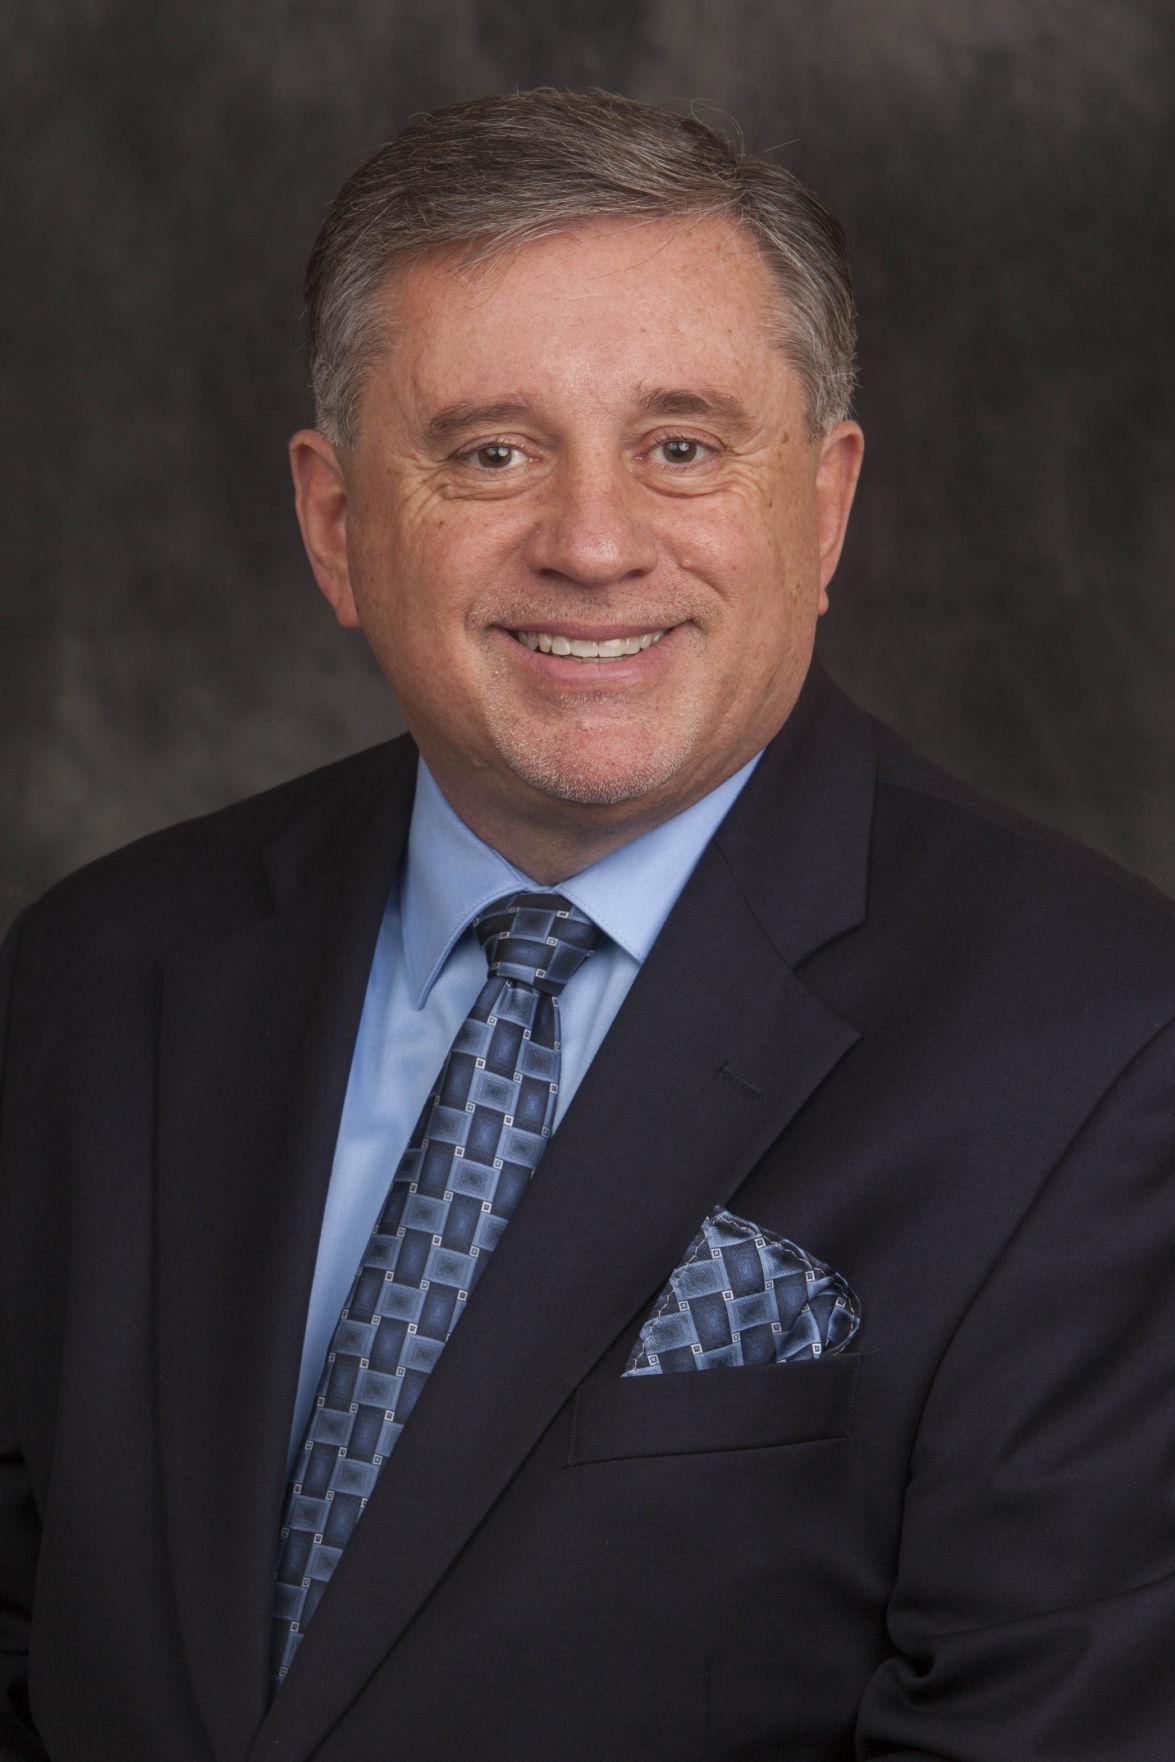 Gordon County Commissioner District 1